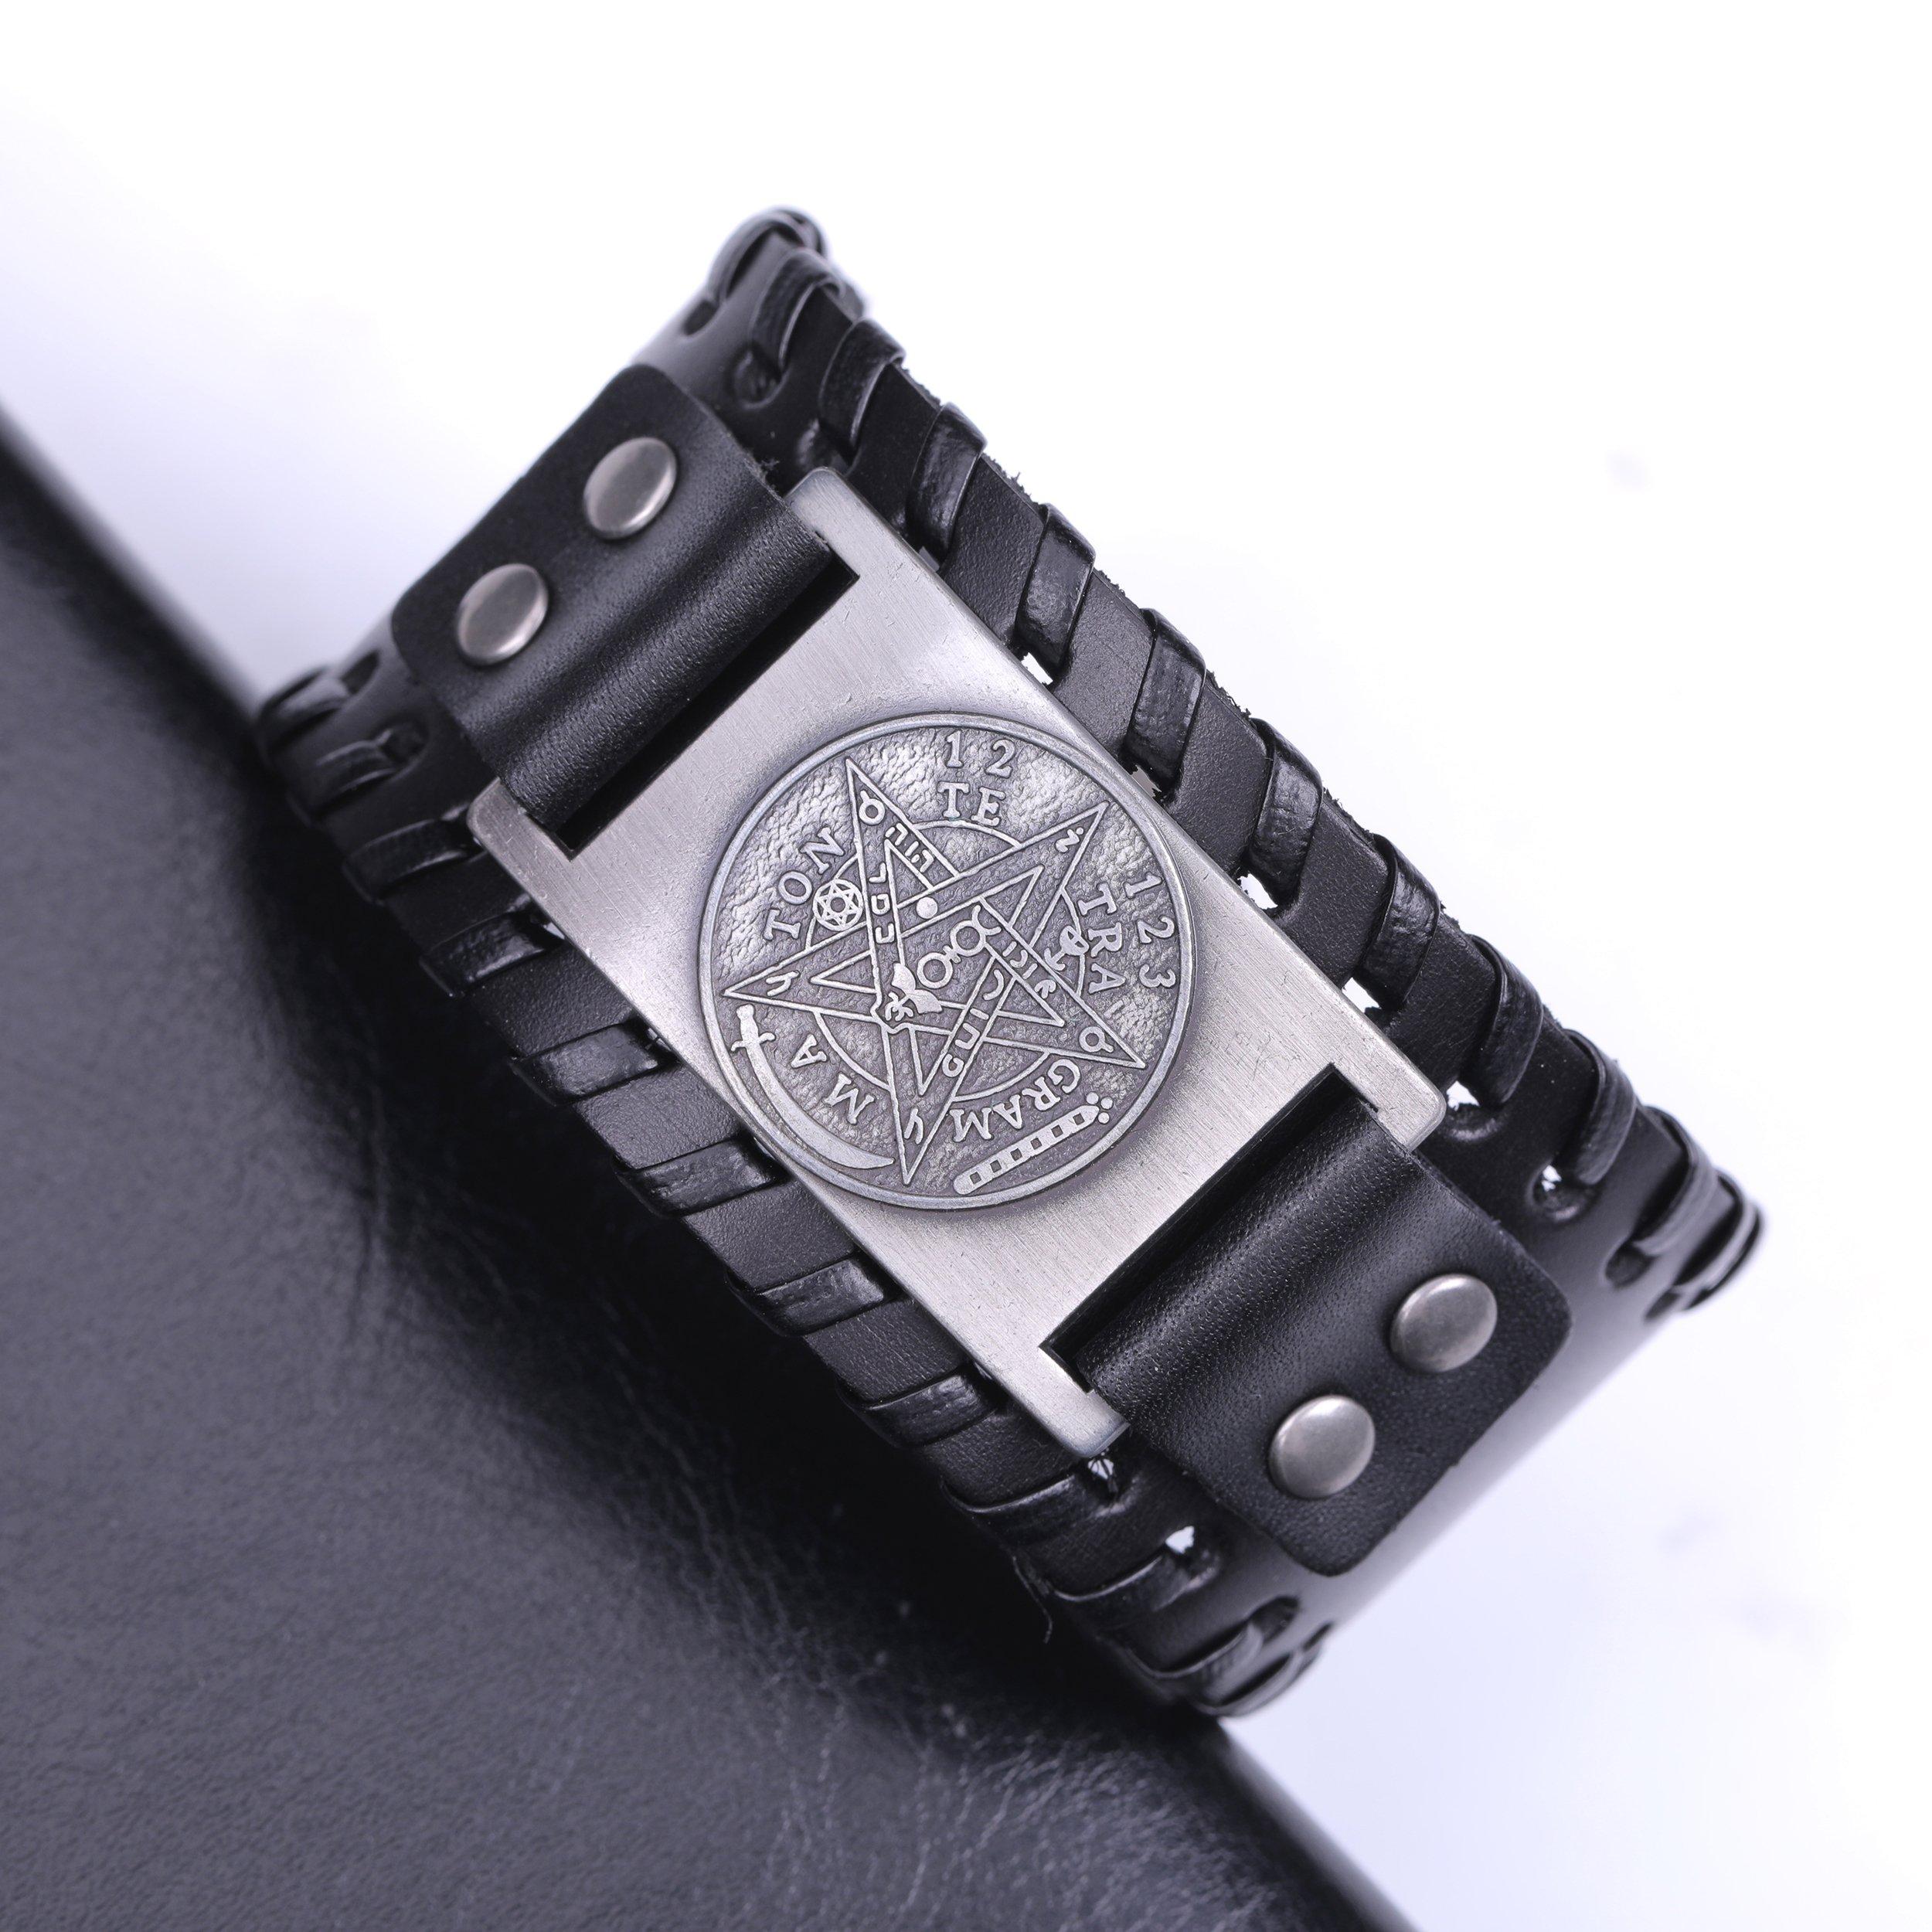 Pagan Viking Tetragrammaton Pentacle Symbol Talisman for Love Braided Wide Leather Wristband Bracelet (Antique Silver,Black) by Skyrim (Image #2)